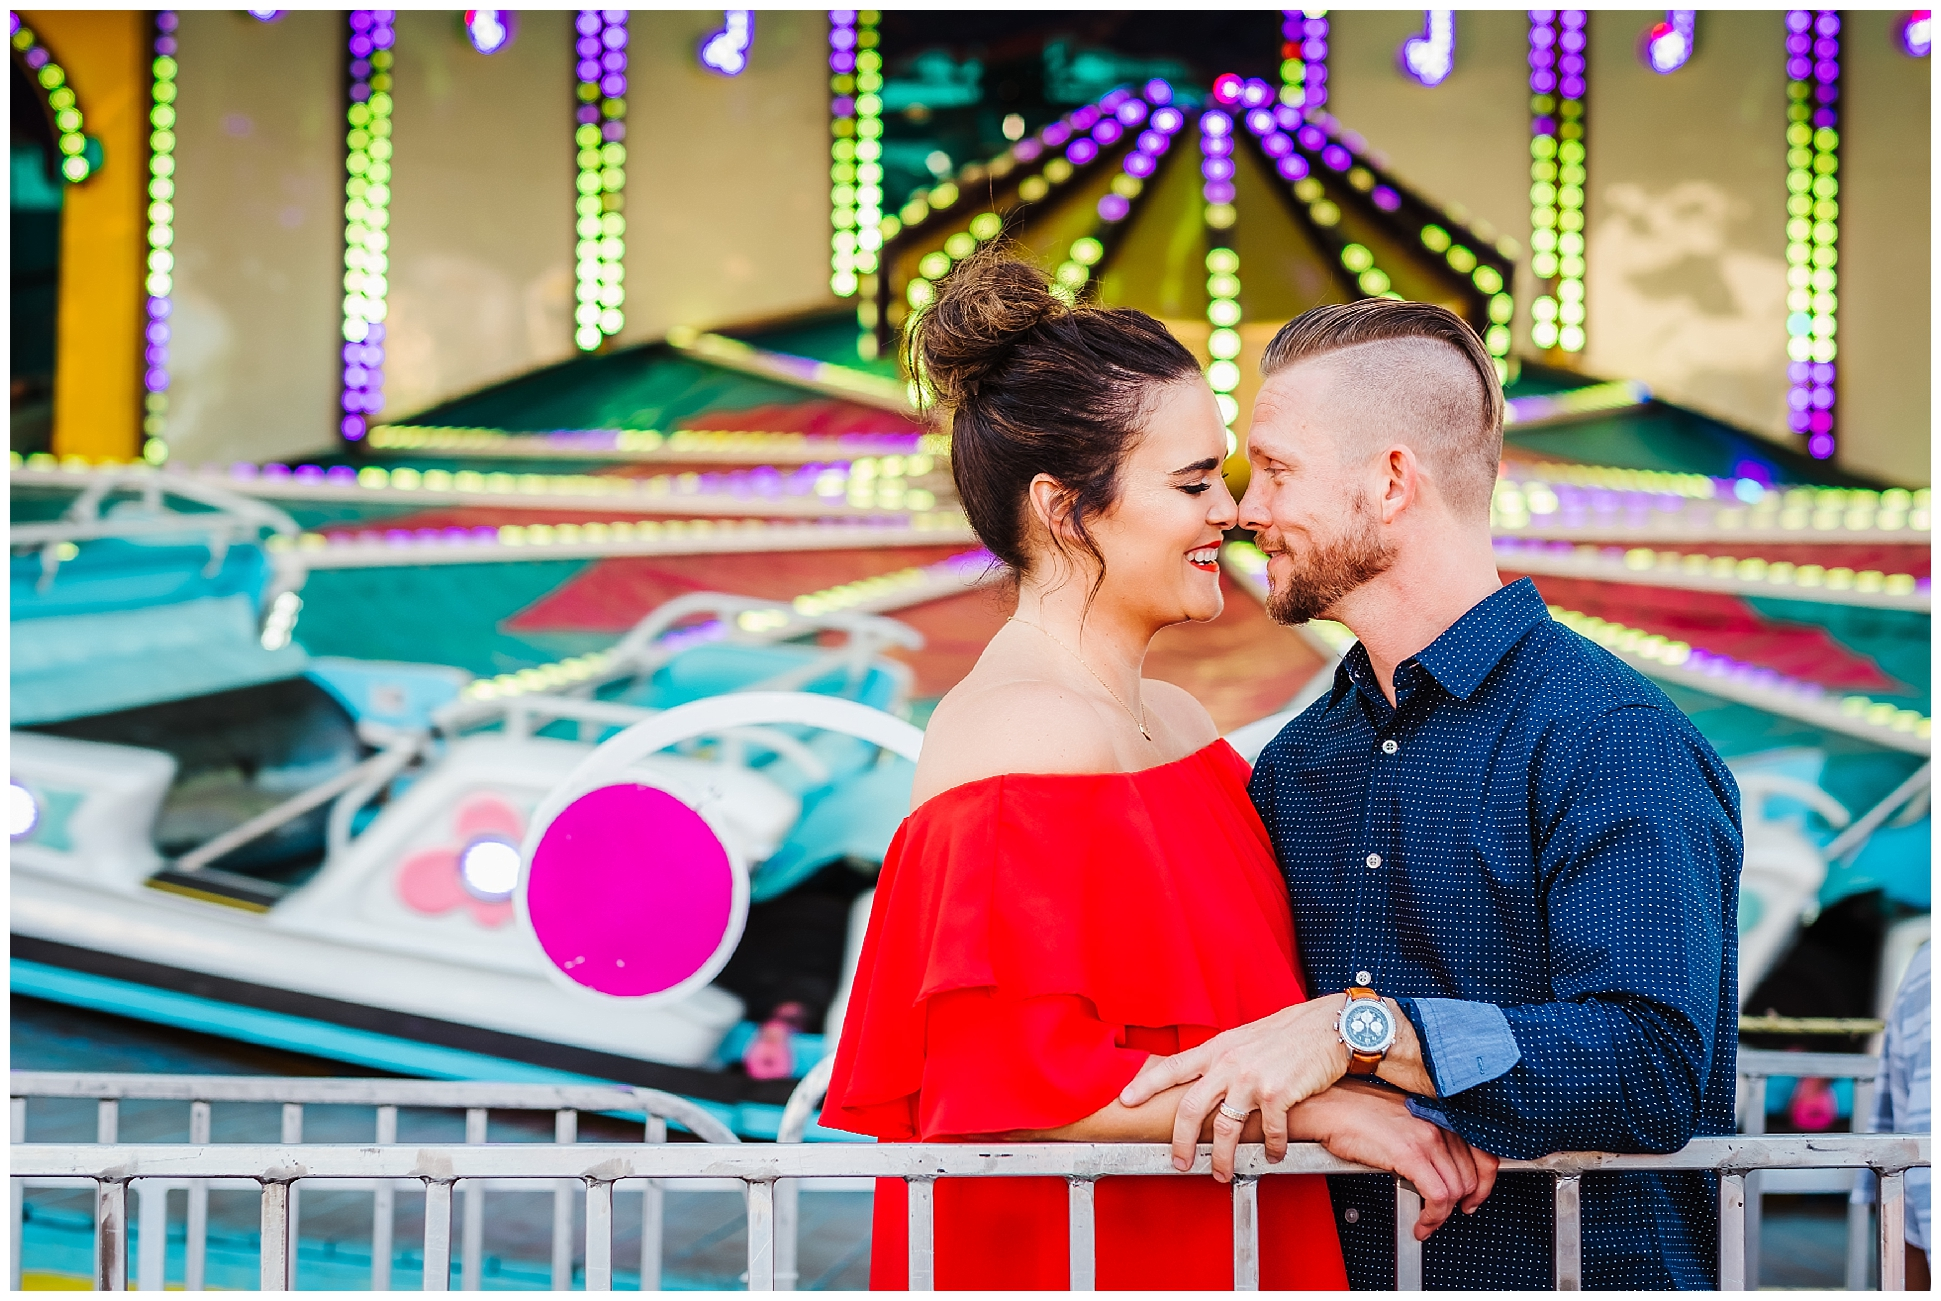 Tampa-colorful-fair-amusement park-family session_0012.jpg